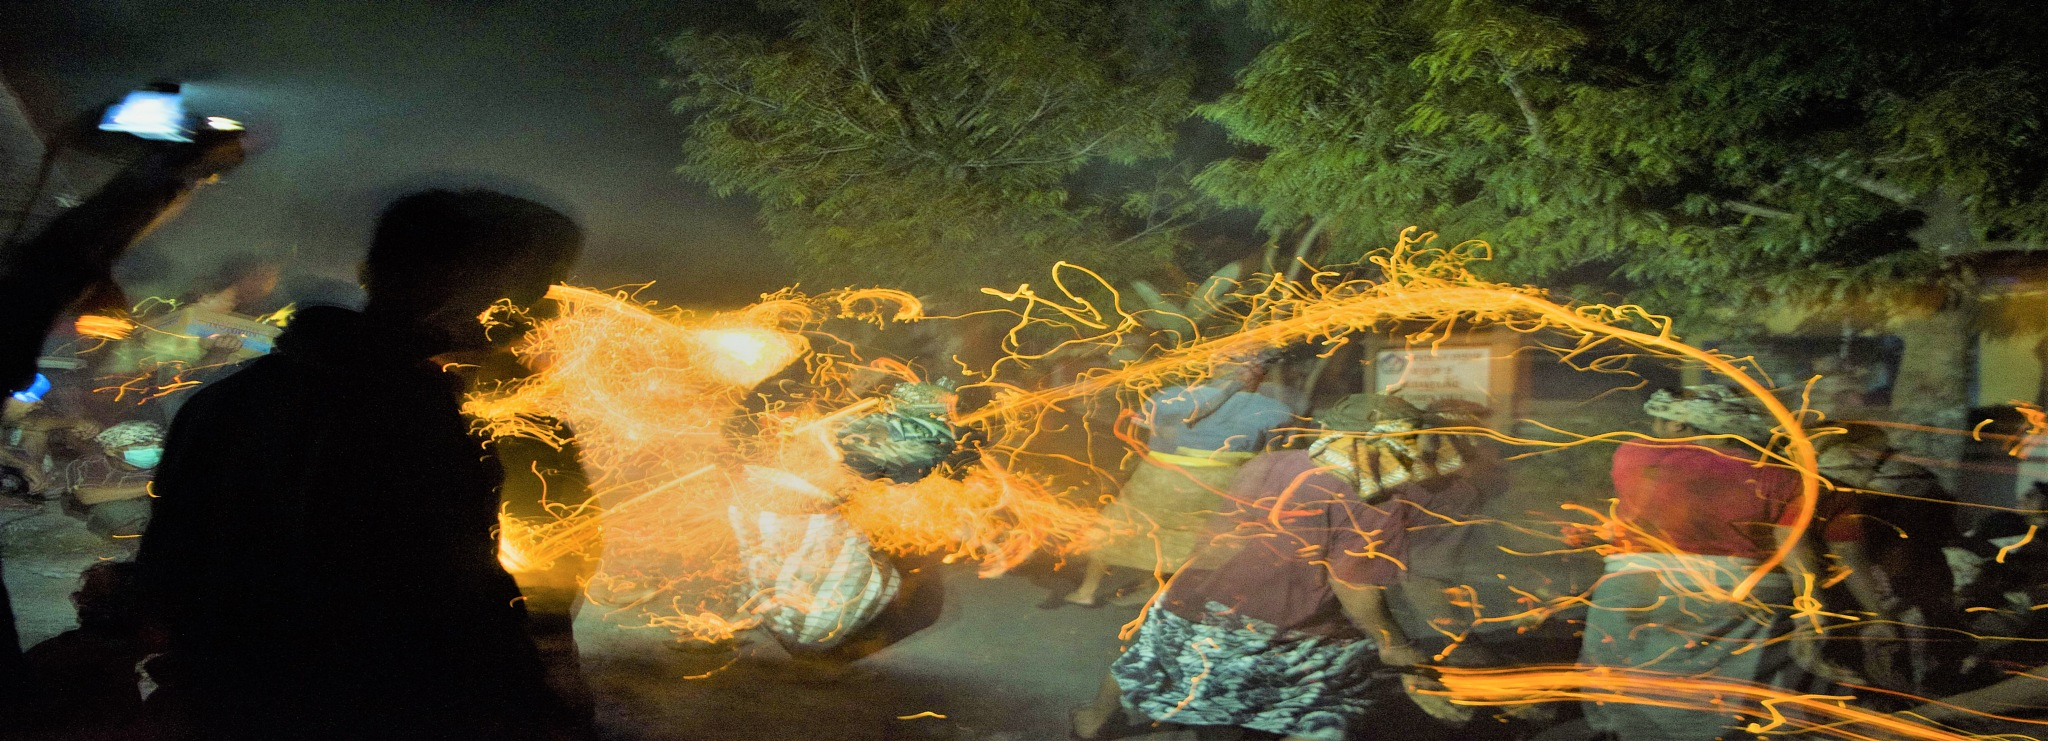 Bermain api by arthamade